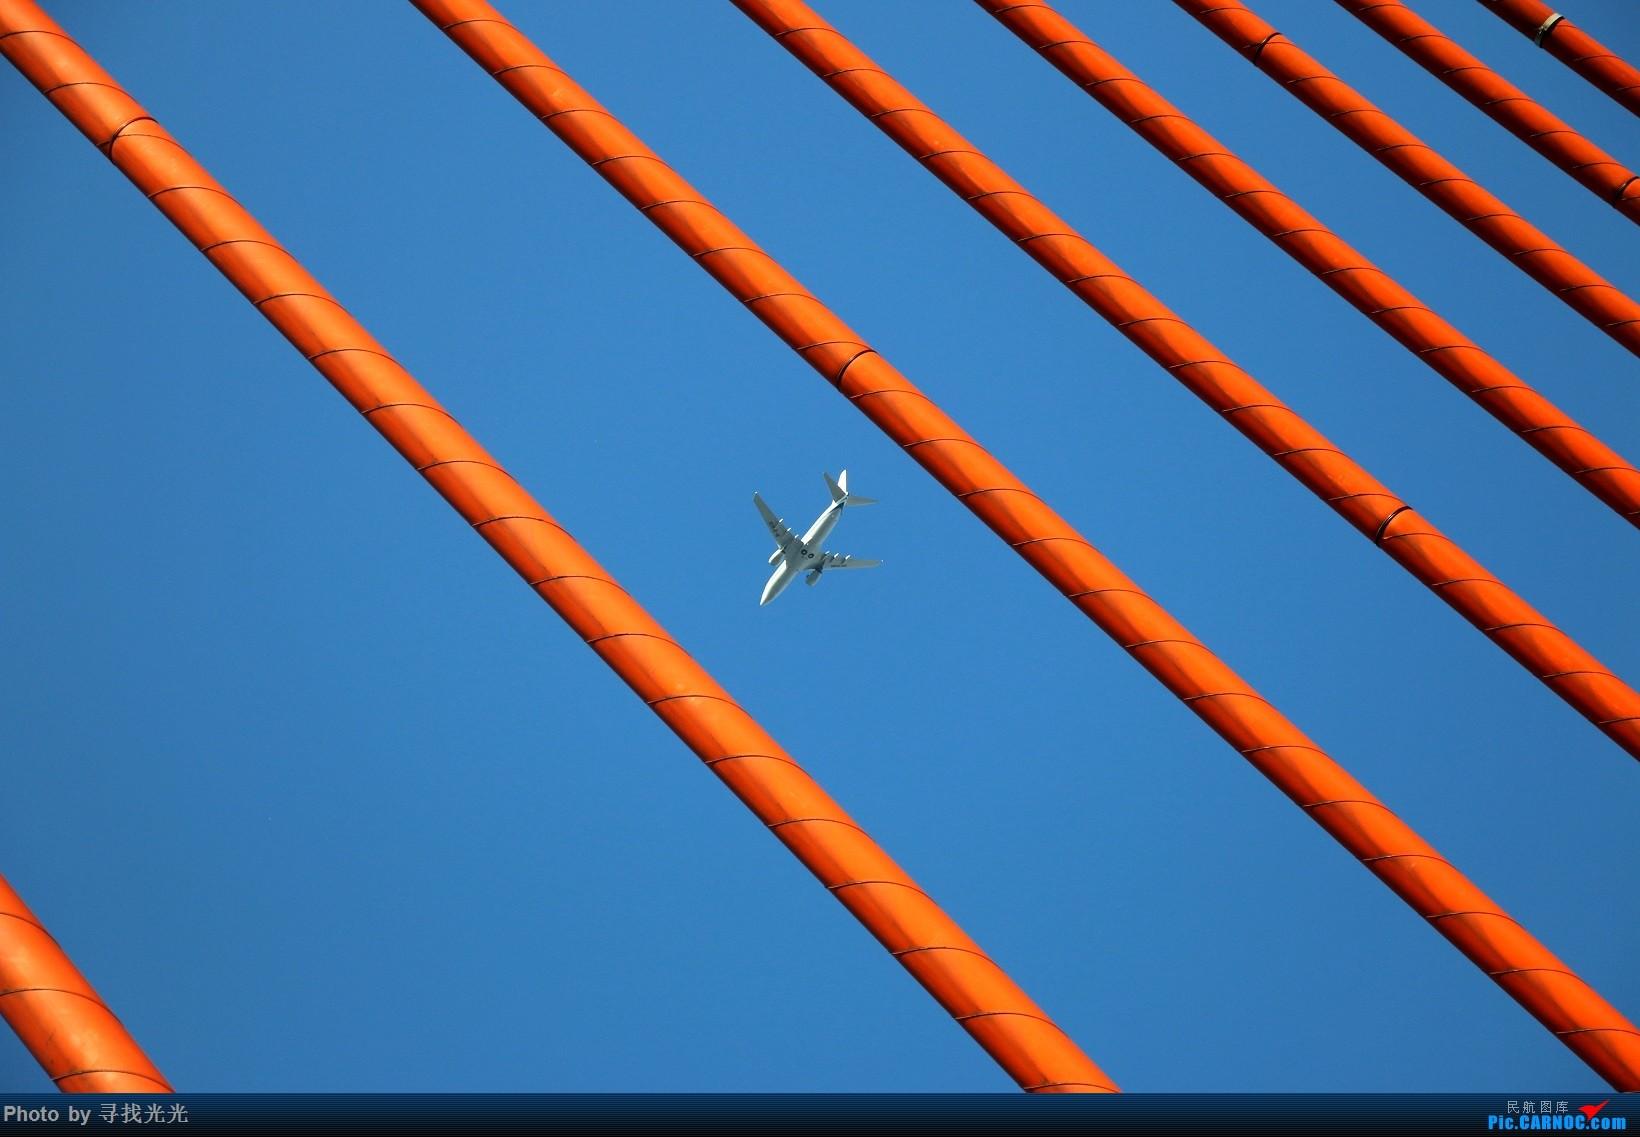 Re:[原创]飞机与山城重庆的桥 BOEING 737-700 B-2612 重庆东水门大桥